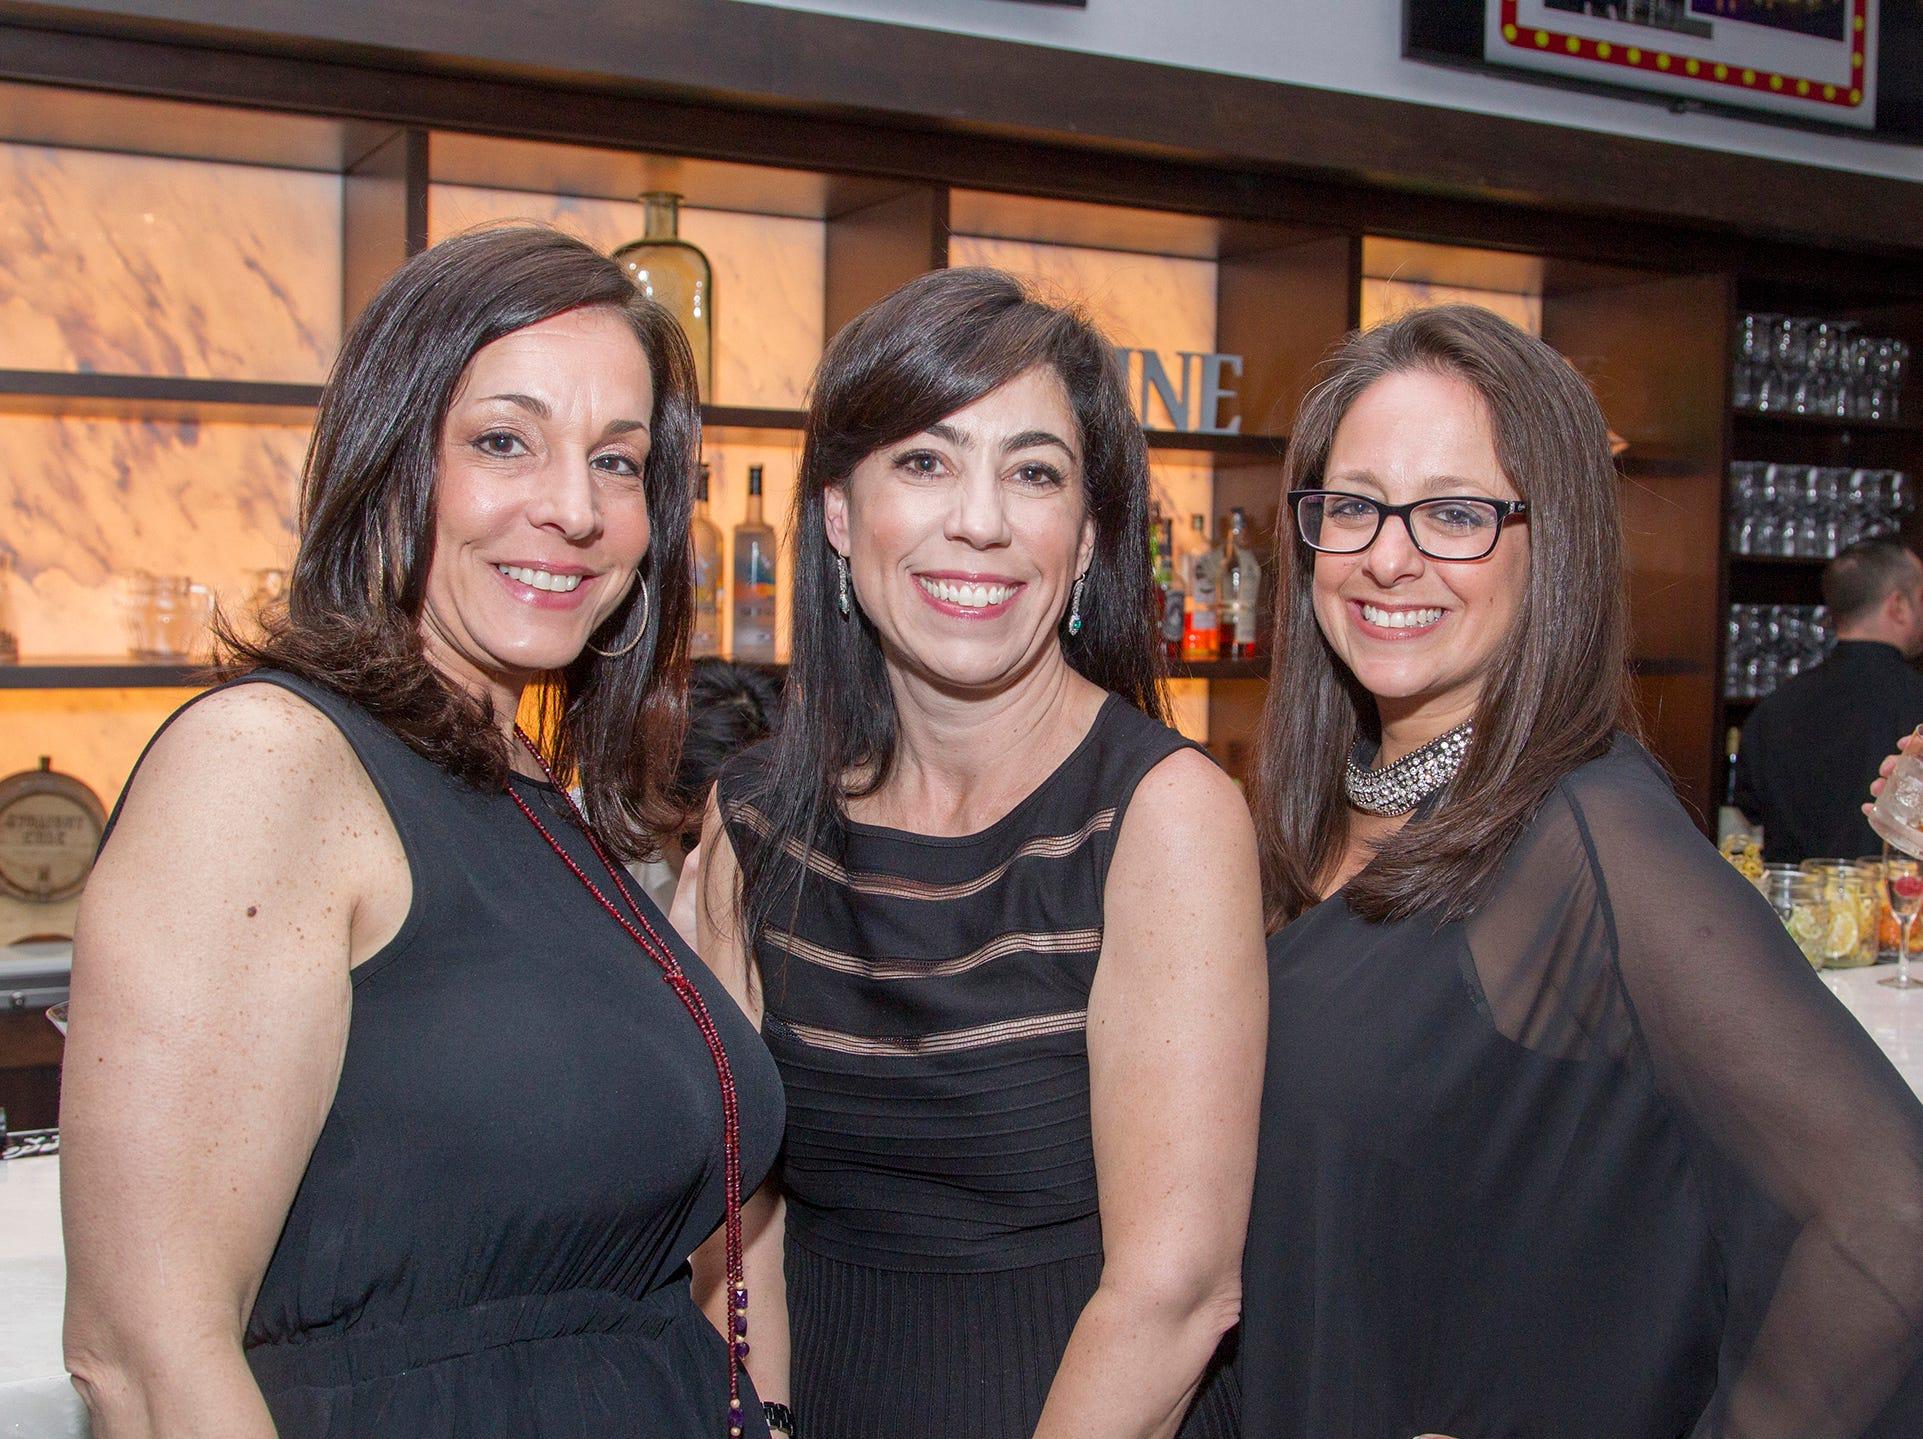 Stephanie Janirr, Melissa Battaglia, Debbie Eliopoulos. Saddle River Day Annual Gala at Alpine Country Club 04/13/2019